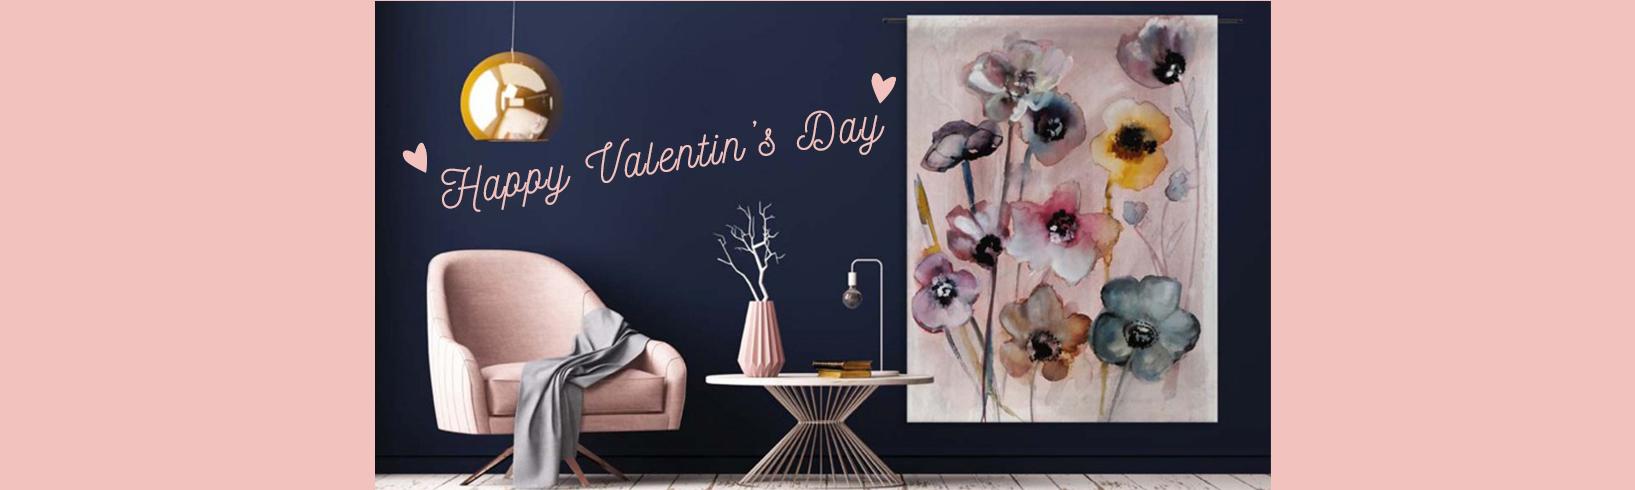 Happy Valentin's days 2019